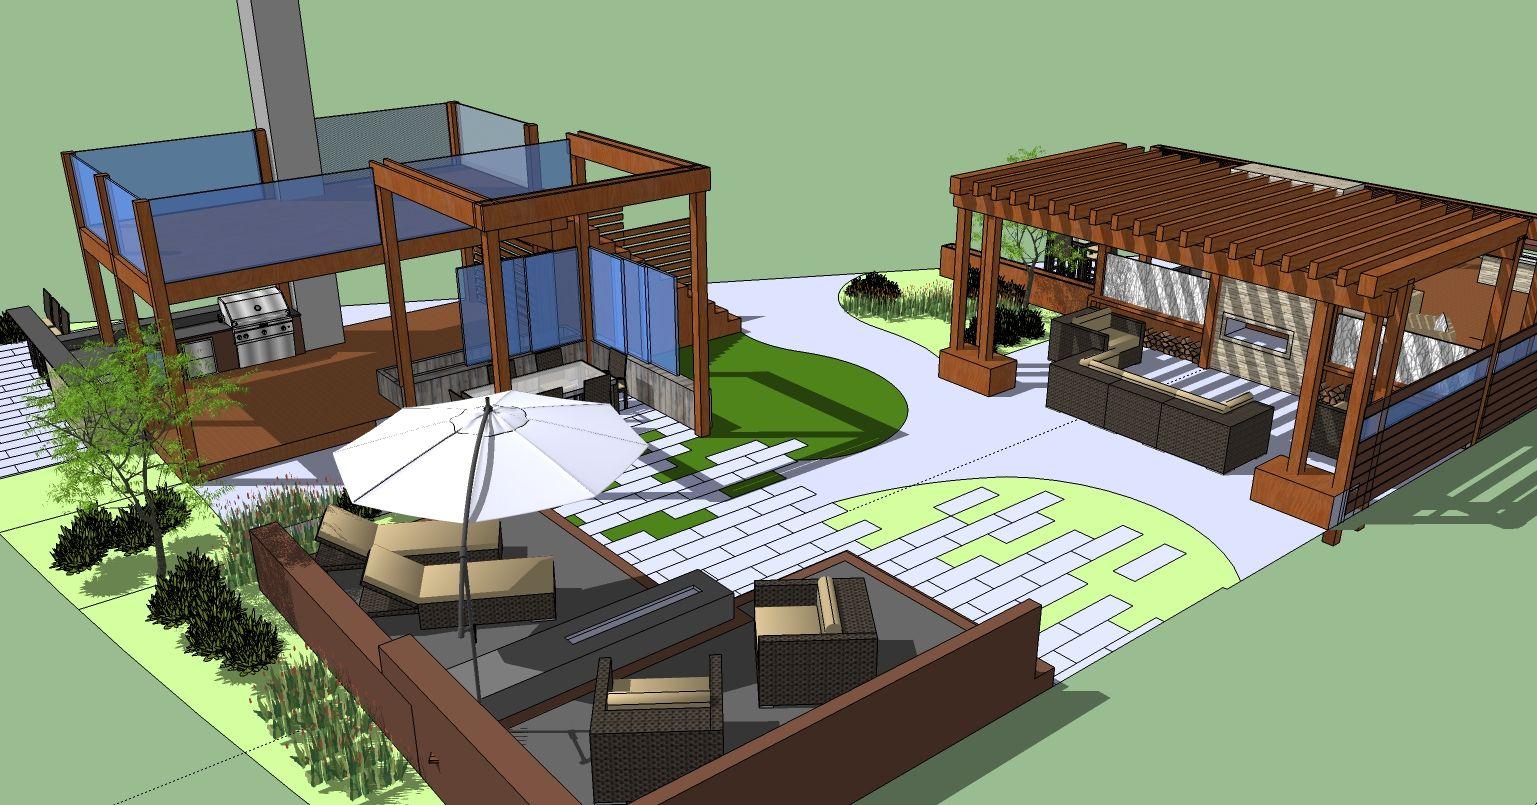 rooftop deck design - Google Search   Outdoor spaces   Pinterest ...